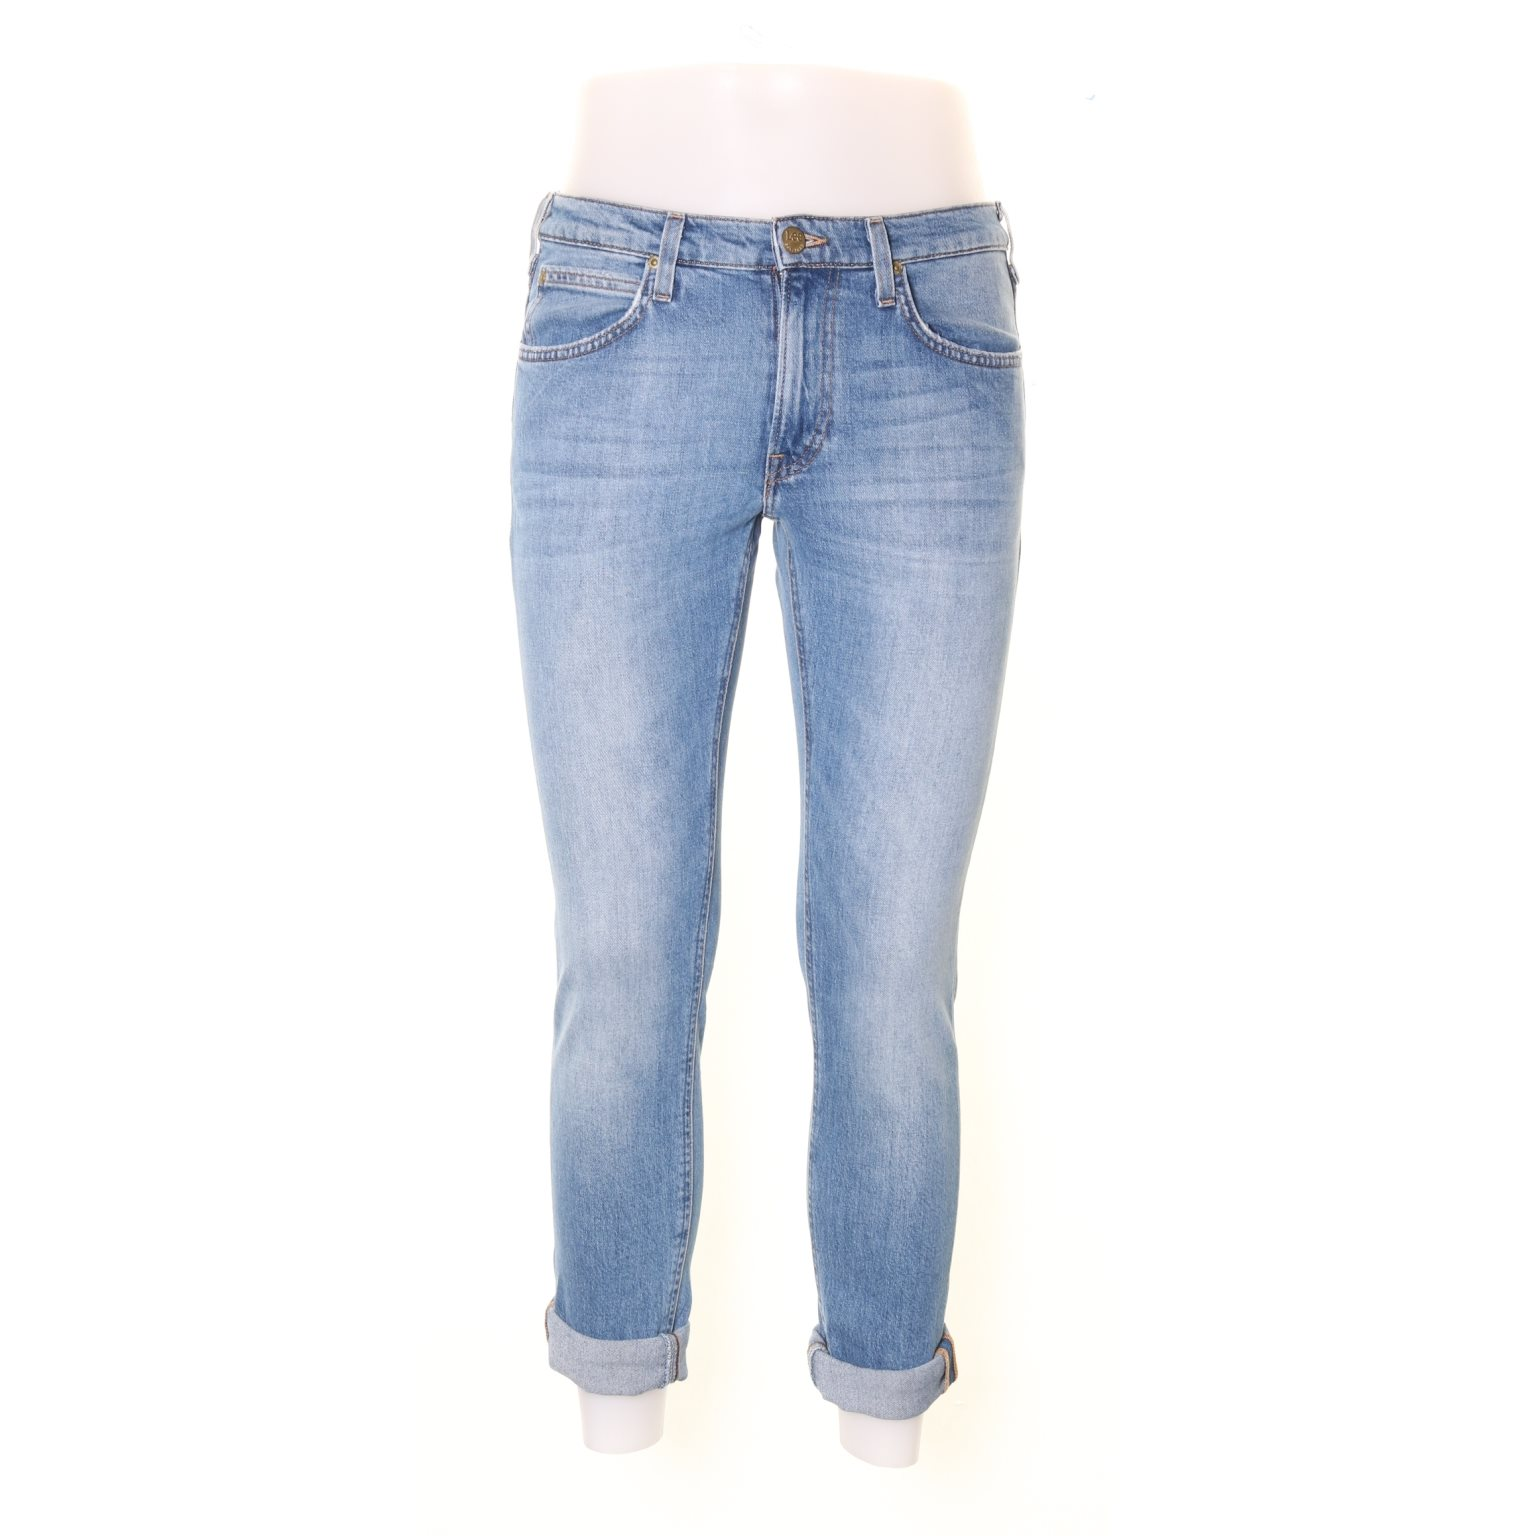 Lee, Jeans, Strl: 29/32, Luke, Ljusblå